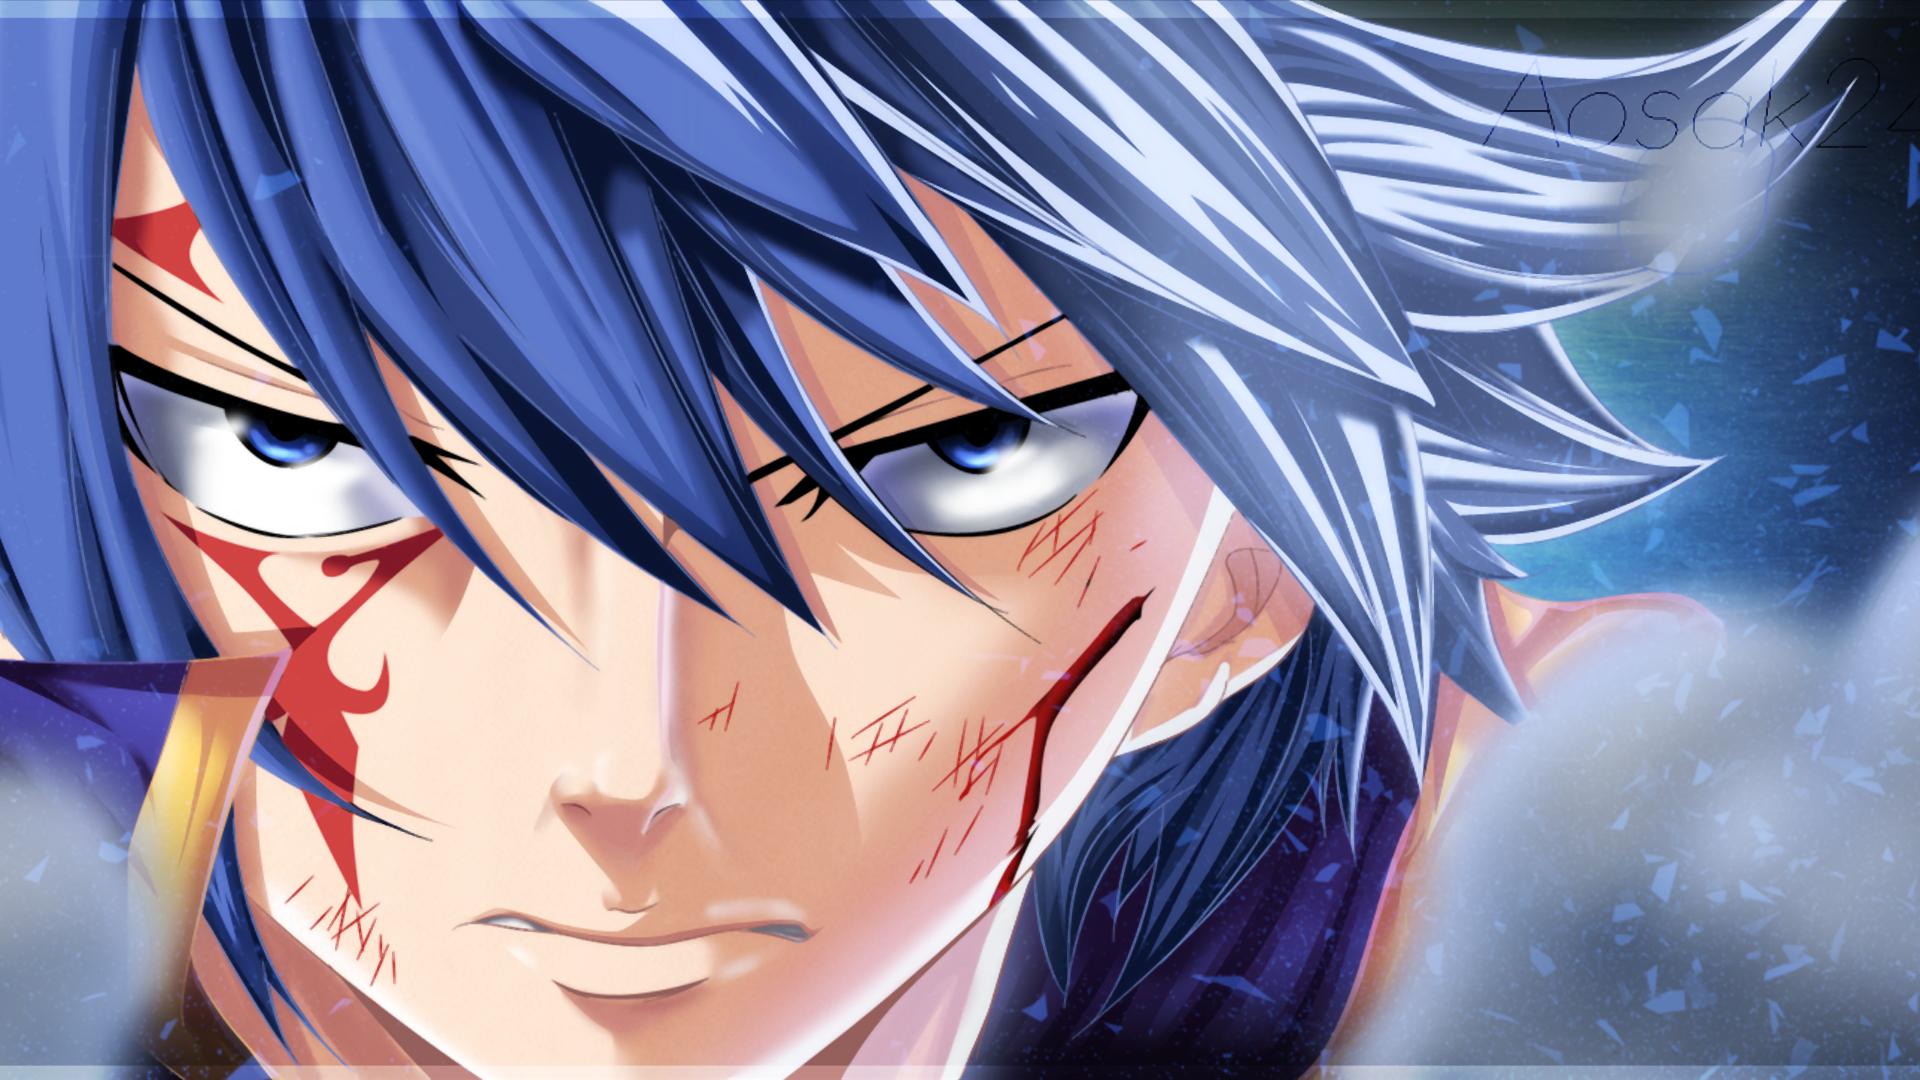 Jellal Fernandes Fairy Tail Anime Hd Wallpaper 1920x1080 1080p